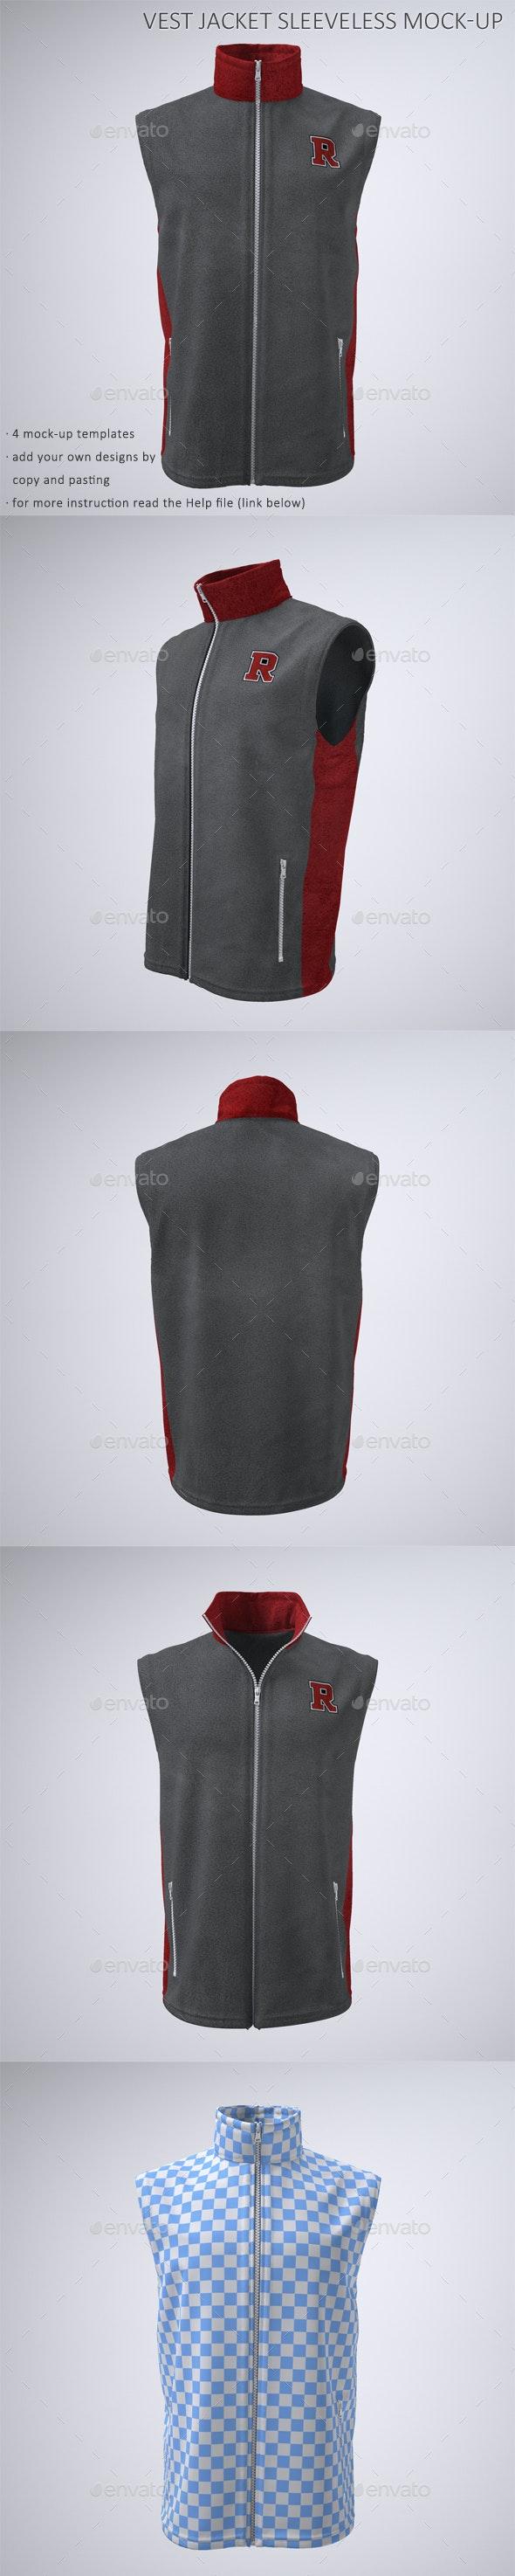 Vest or Sleeveless Jacket Mock-Up - Apparel Product Mock-Ups